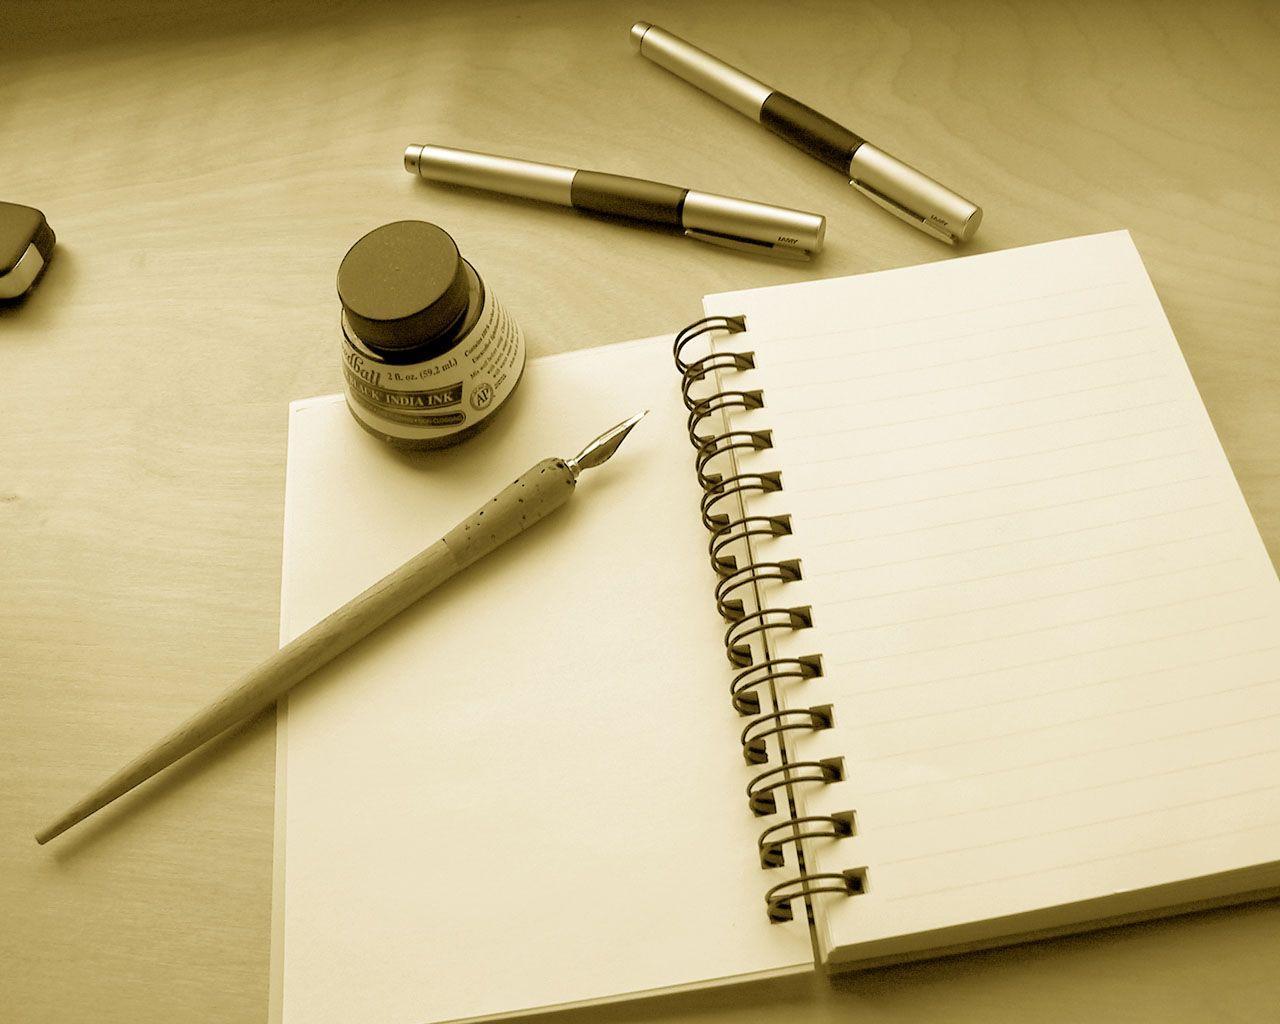 Writing Art Wallpapers - Top Free Writing Art Backgrounds - WallpaperAccess